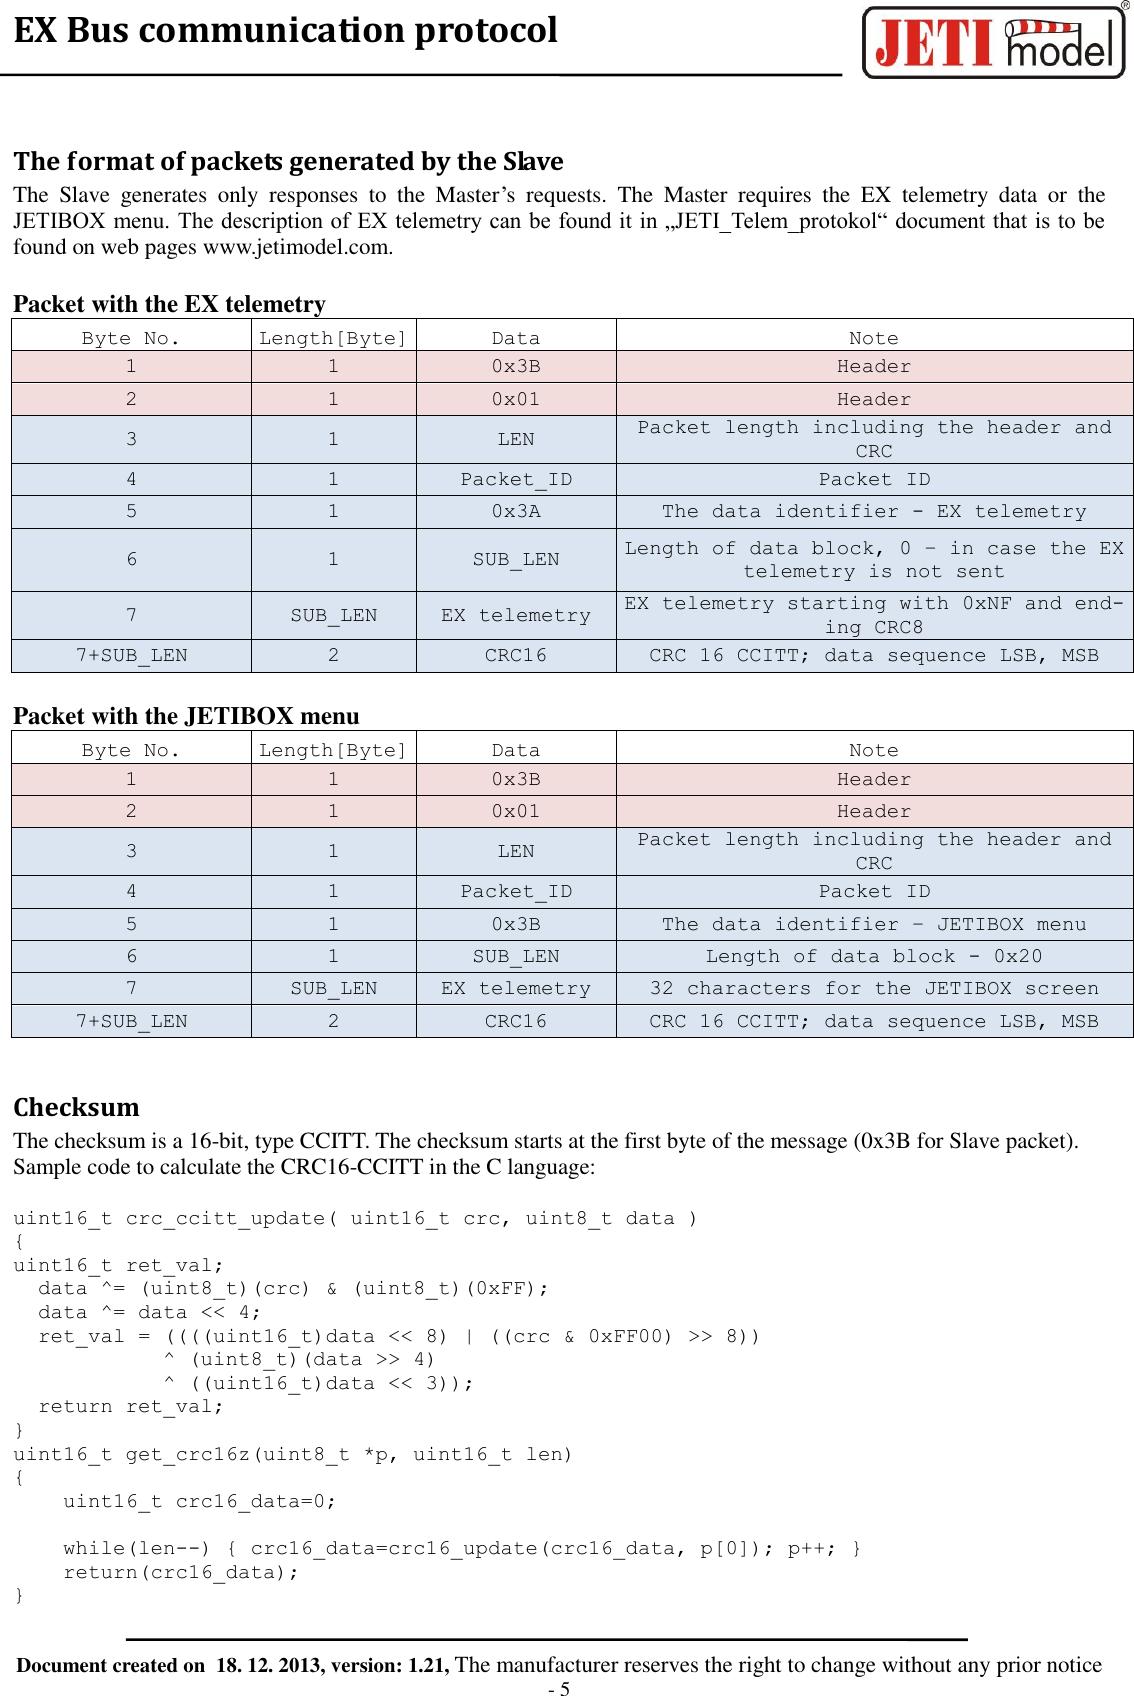 EX_Bus_protokol_v121_EN EX Bus Protokol V121 EN